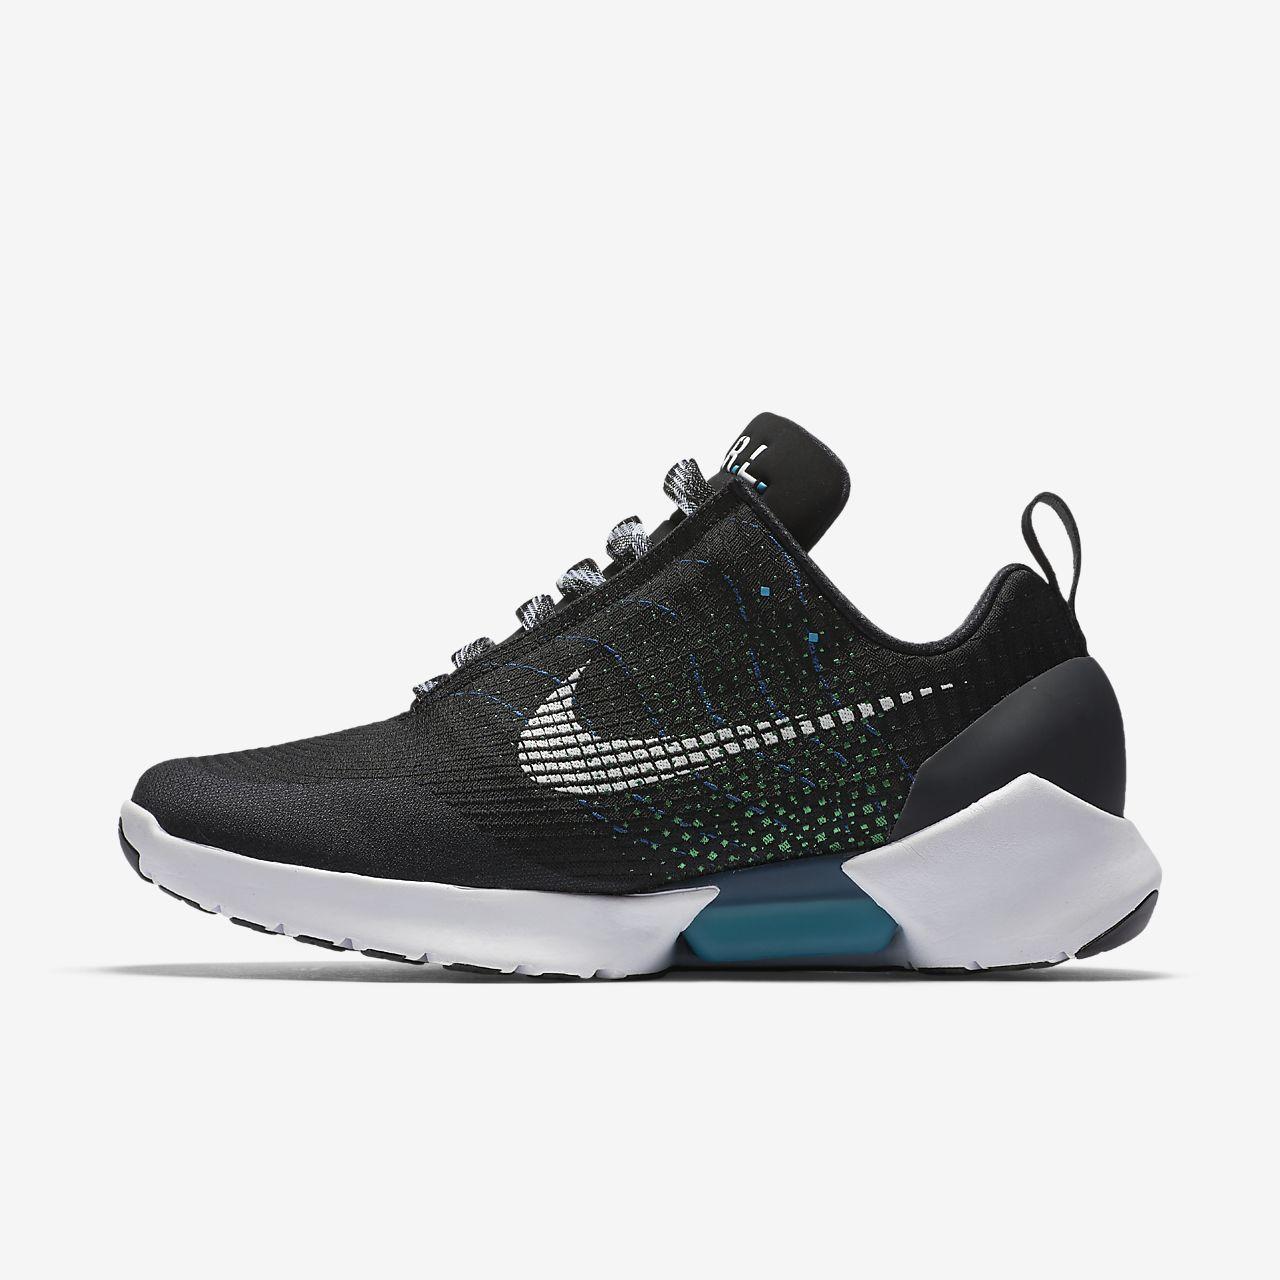 premium selection 5d7a5 0a7d3 ... Sko Nike HyperAdapt 1.0 för män (EU-kontakt)